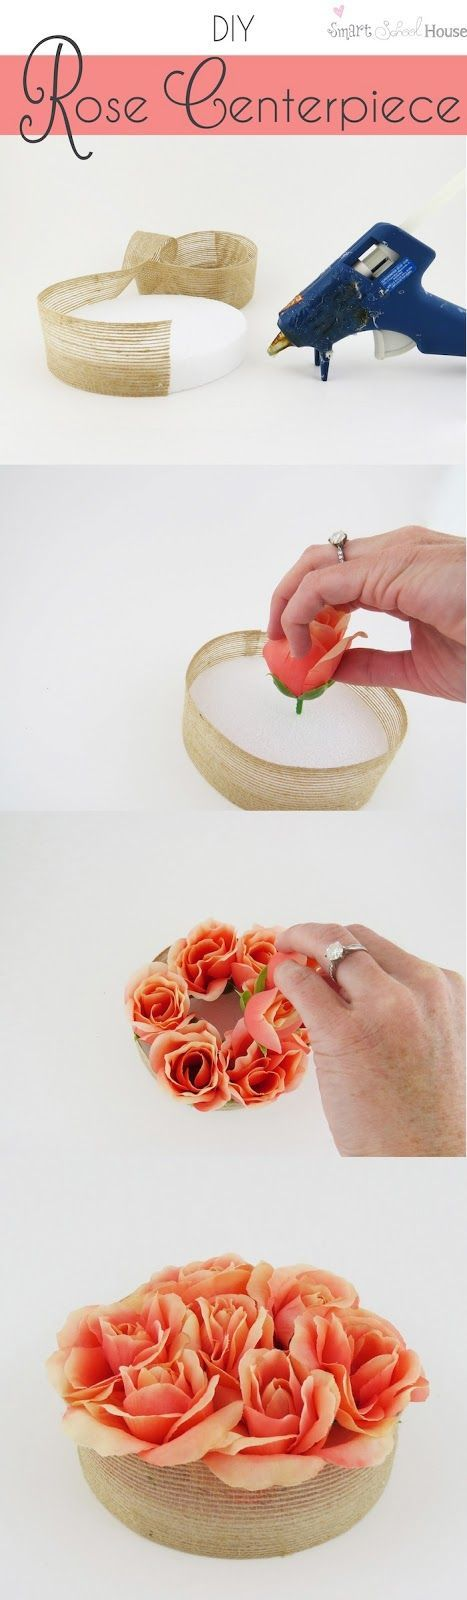 DIY rose centerpiece for your wedding.